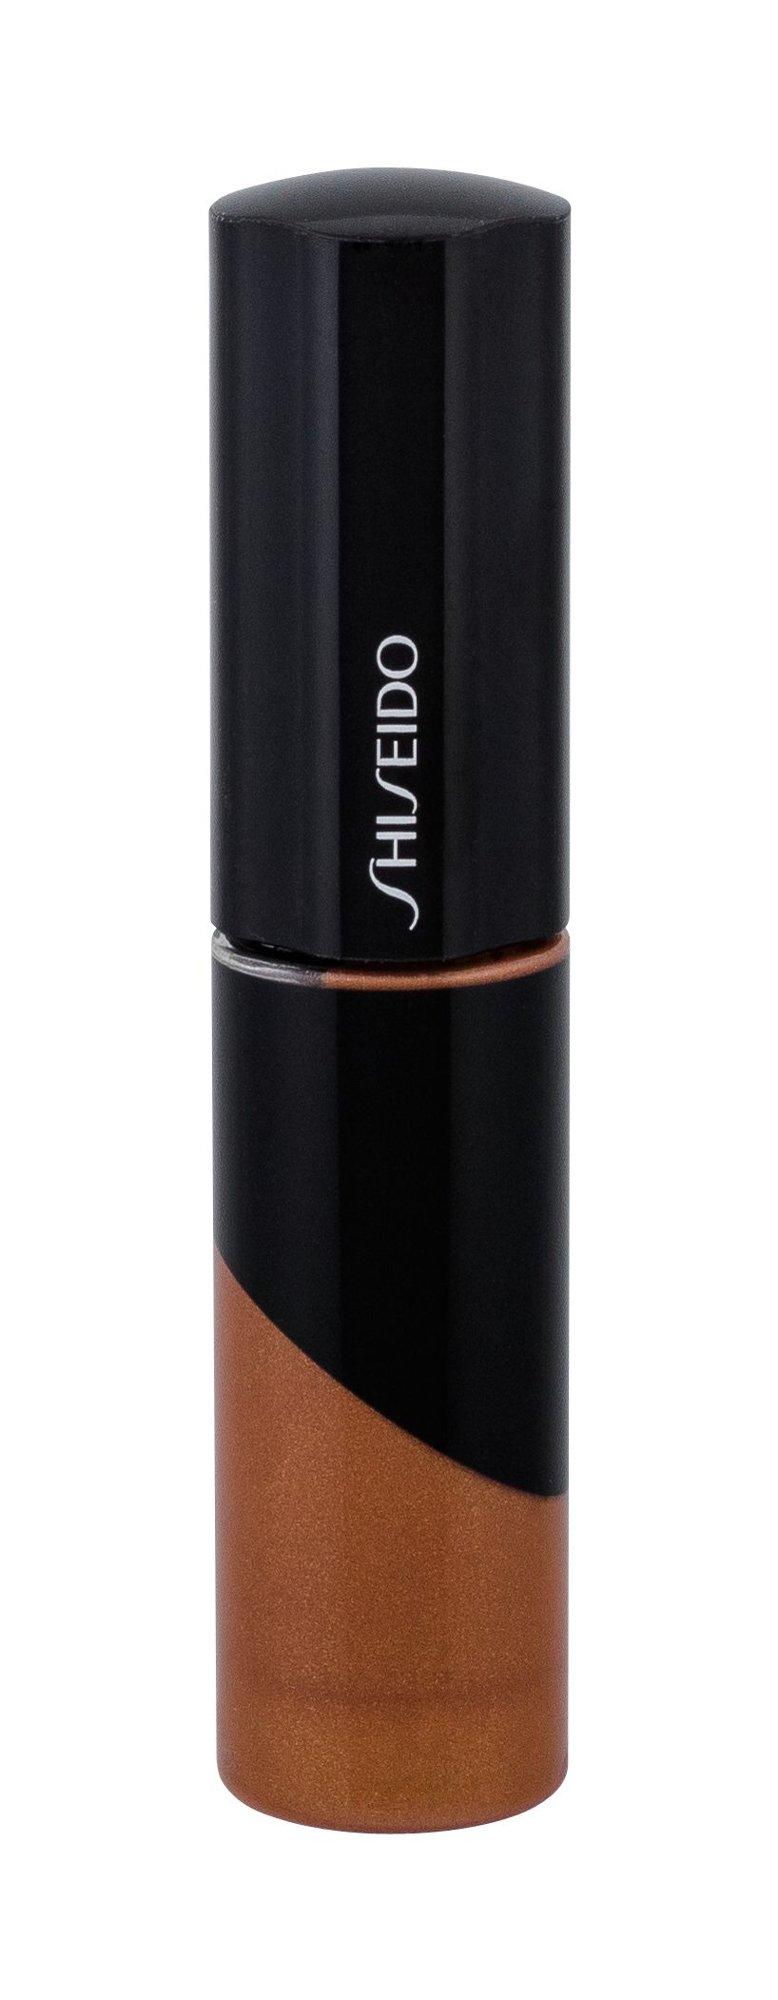 Shiseido Lacquer Gloss Lip Gloss 7,5ml BR301